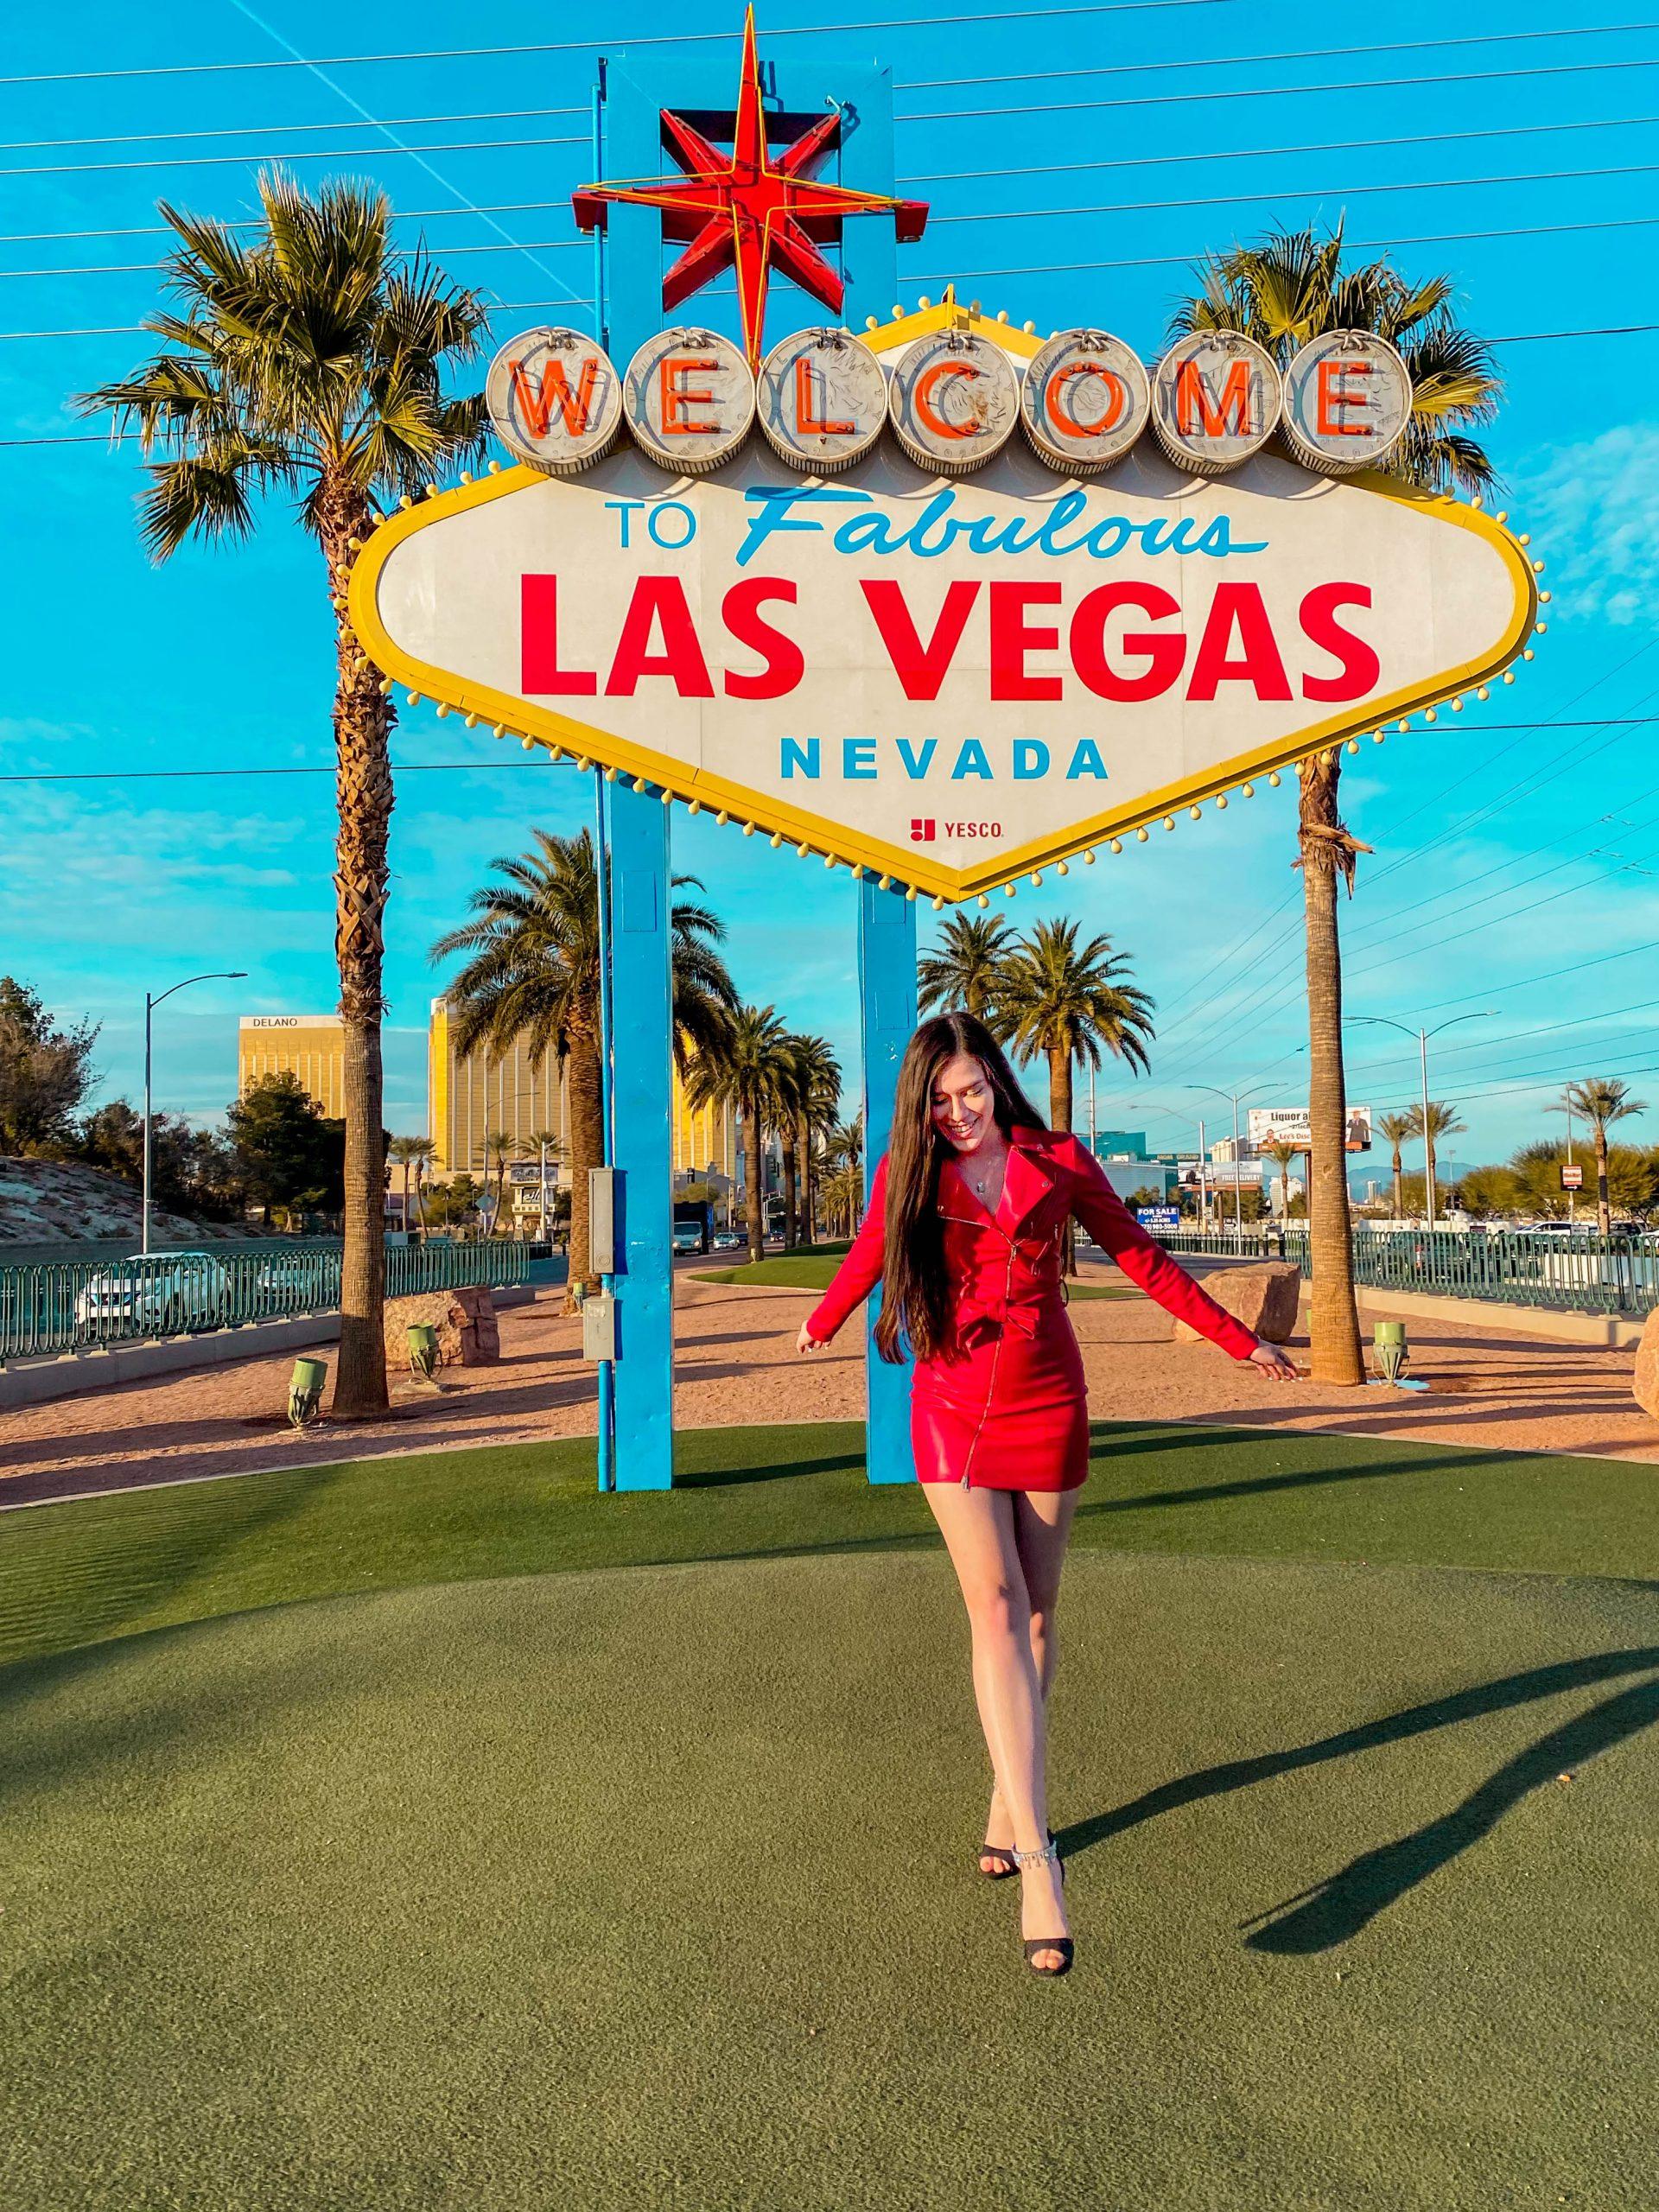 welcome to fabulous las vegas nevasa sign, oh polly moto dress, instagrammable landmark las vegas, photo worthy spot las vegas